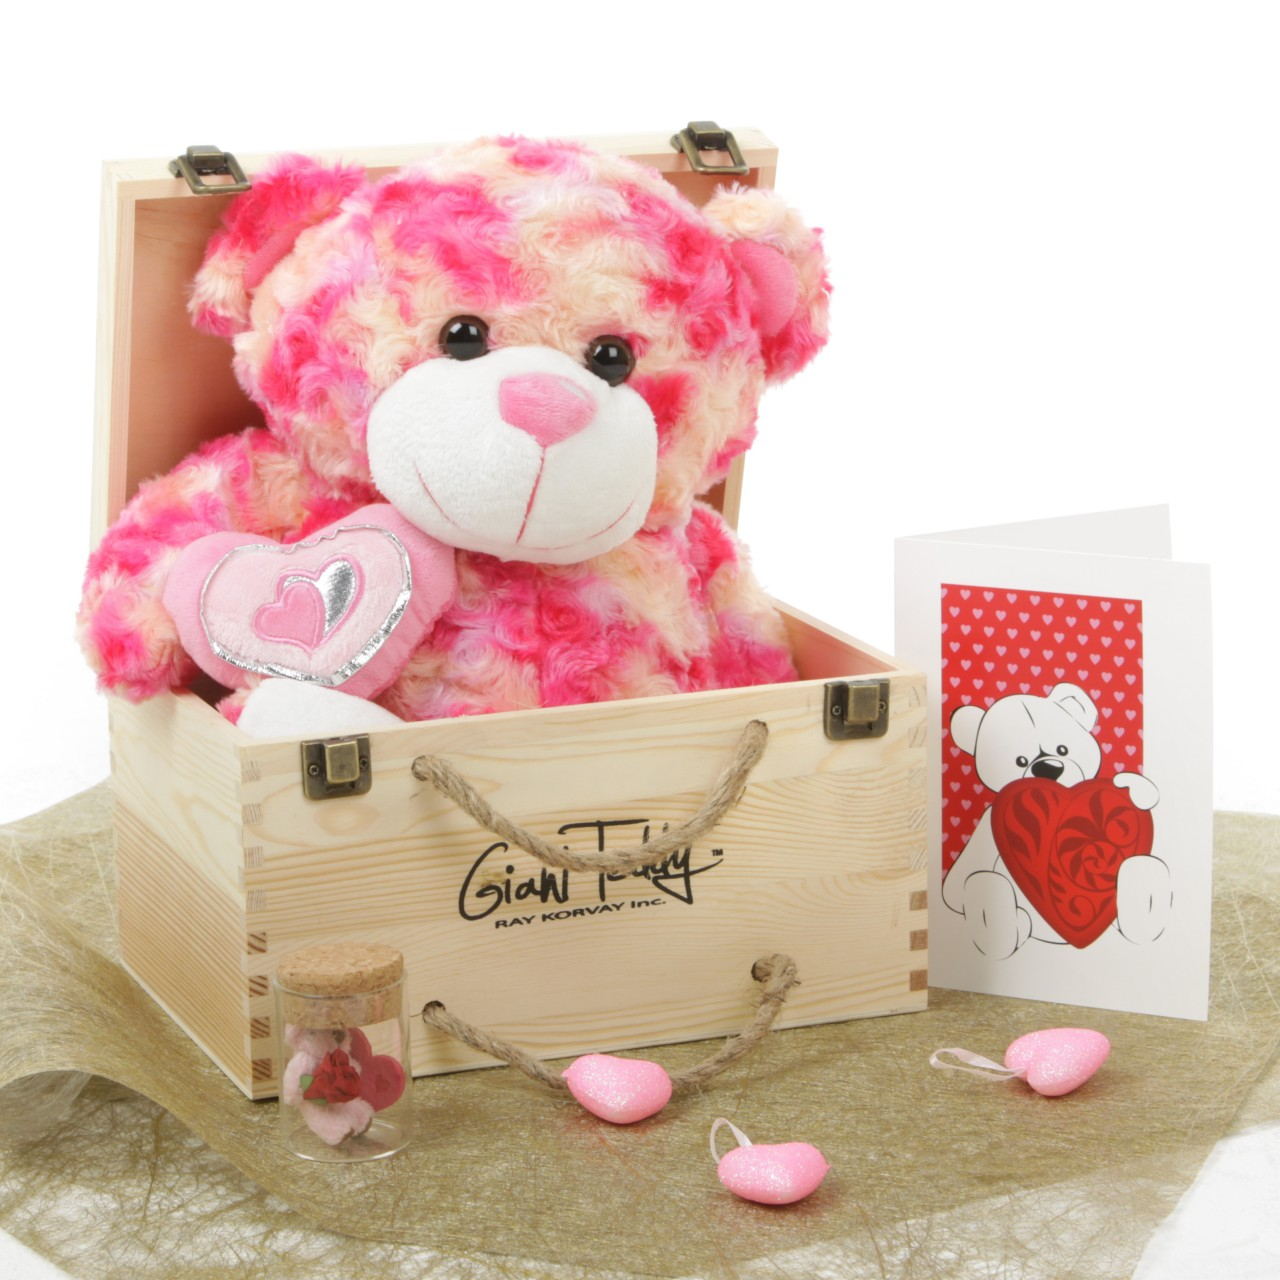 Best Wallpaper Love Teddy Bear - Love+Teddy+Bear+Wallpapers+7  Collection_40774.jpg